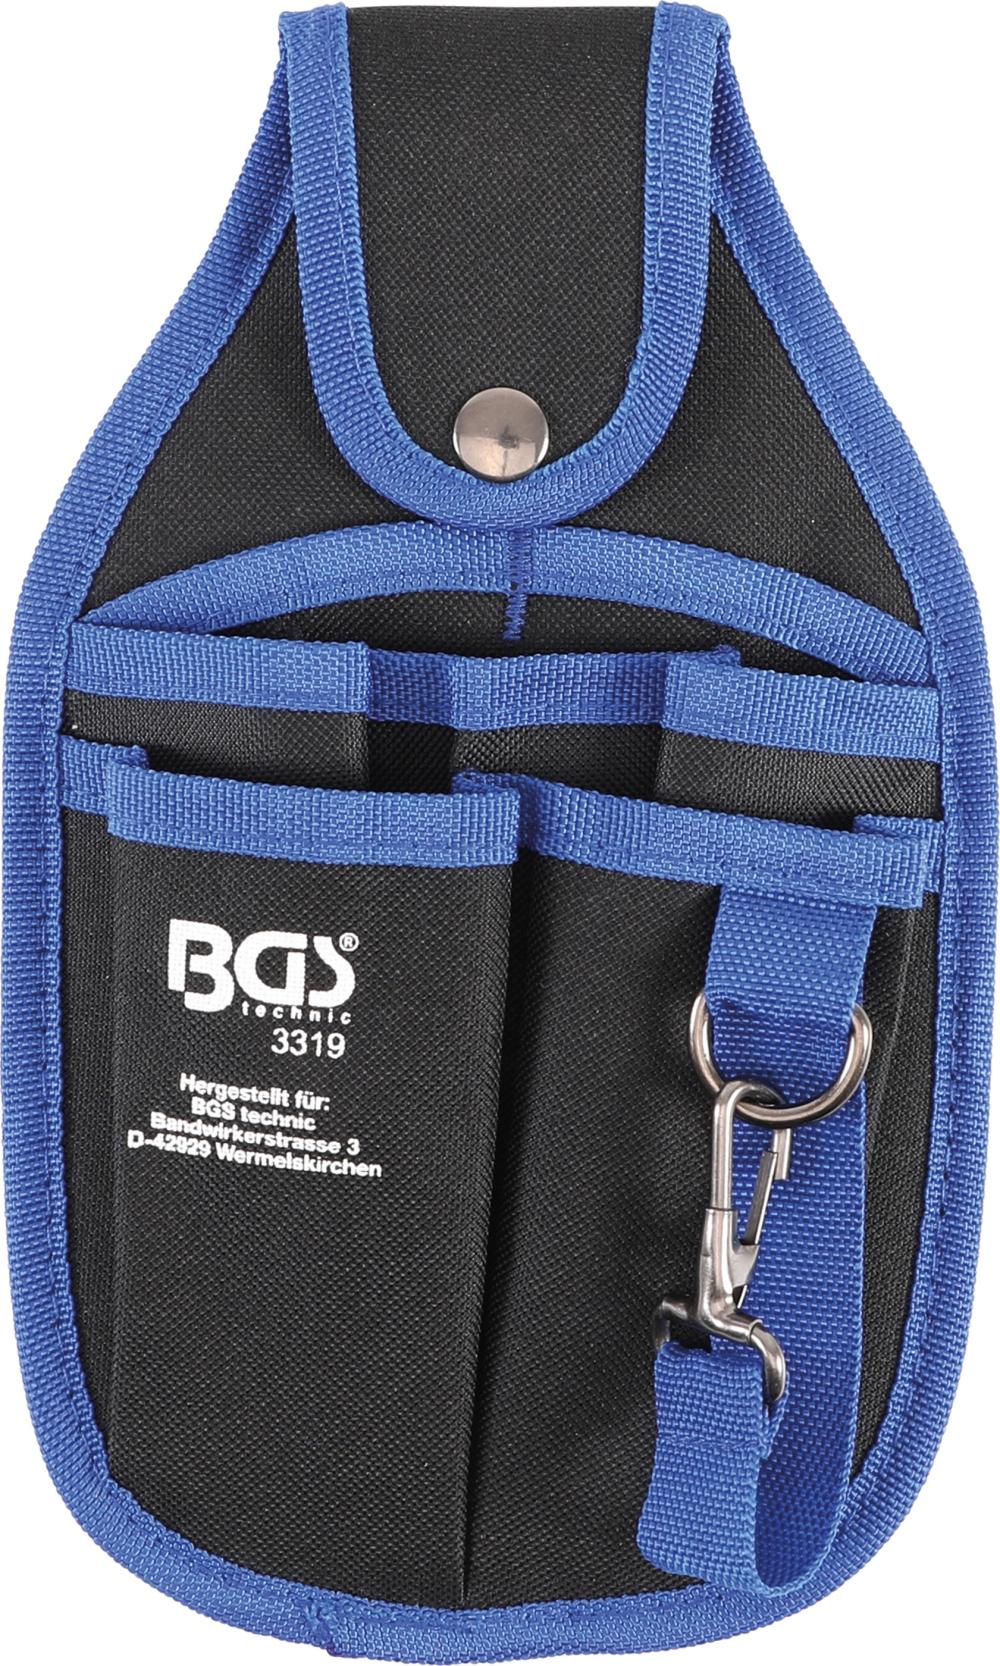 BGS 3319 Gürteltasche aus Nylon